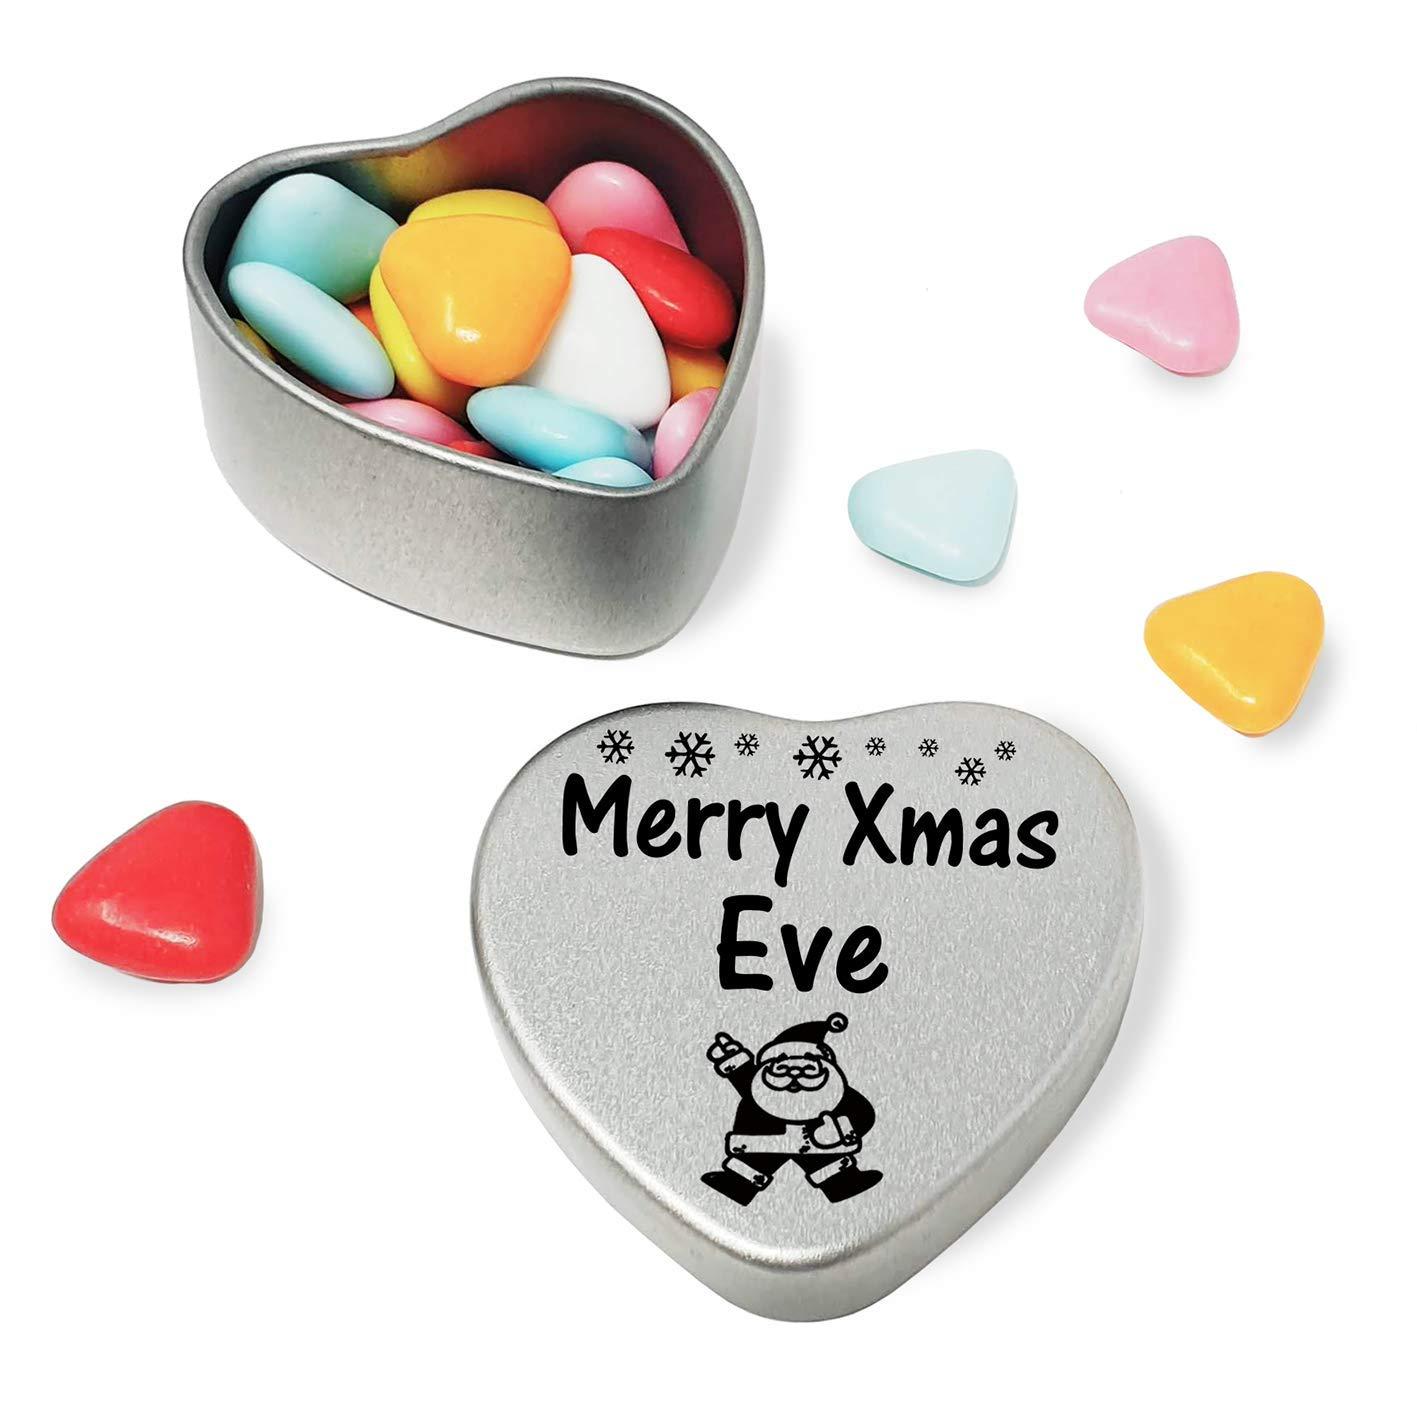 Merry Xmas Grant Mini Heart Tin Gift Present Happy Christmas Stocking Filler